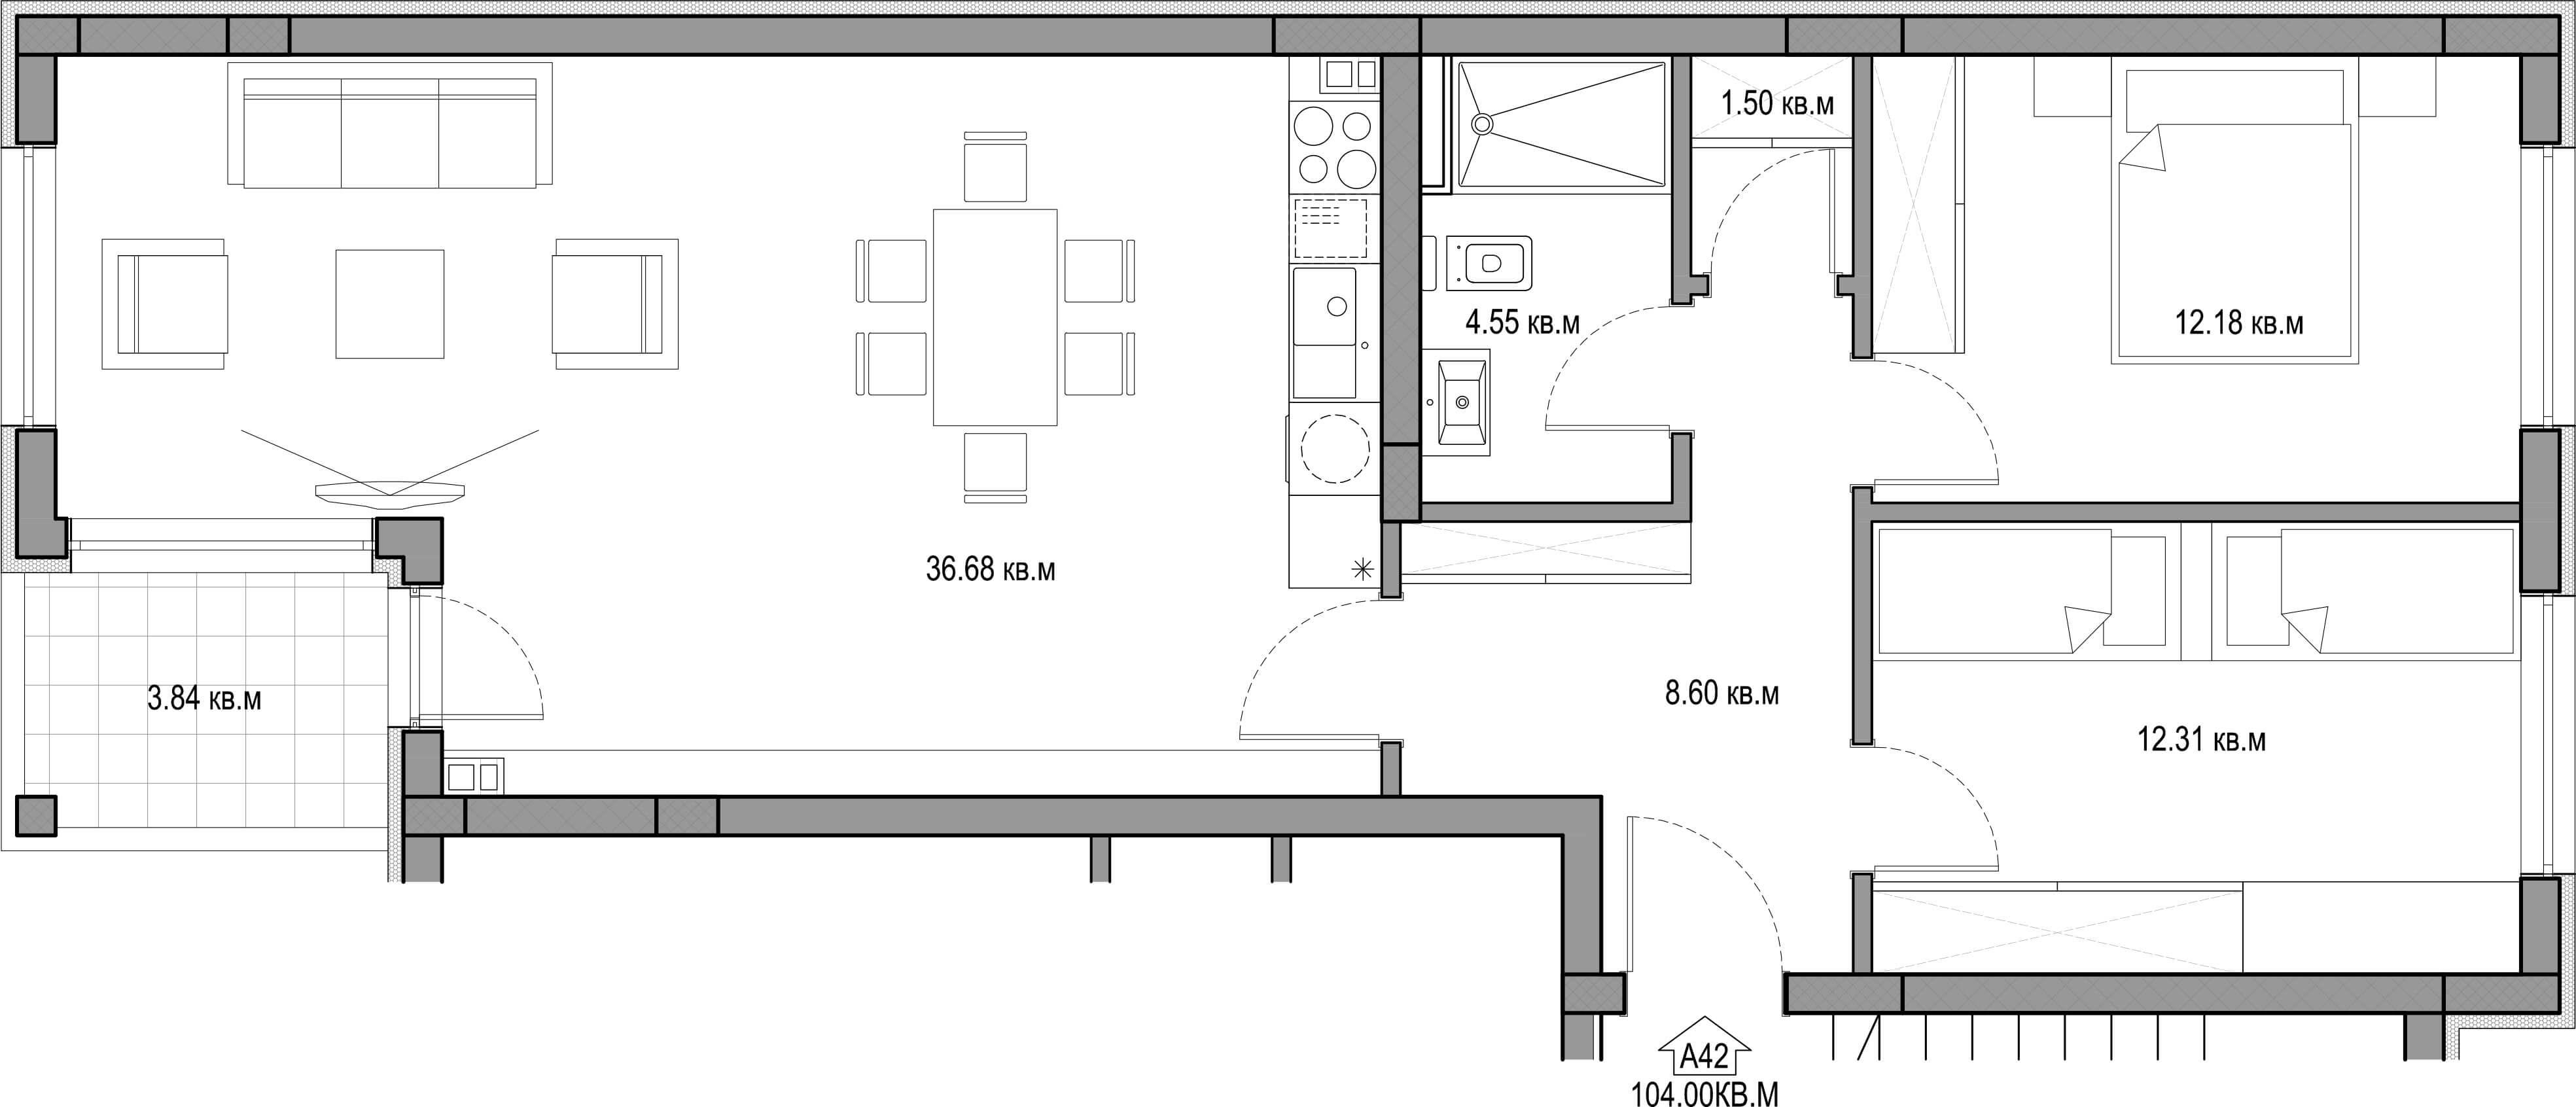 Vinitsa_Apartment_2_42